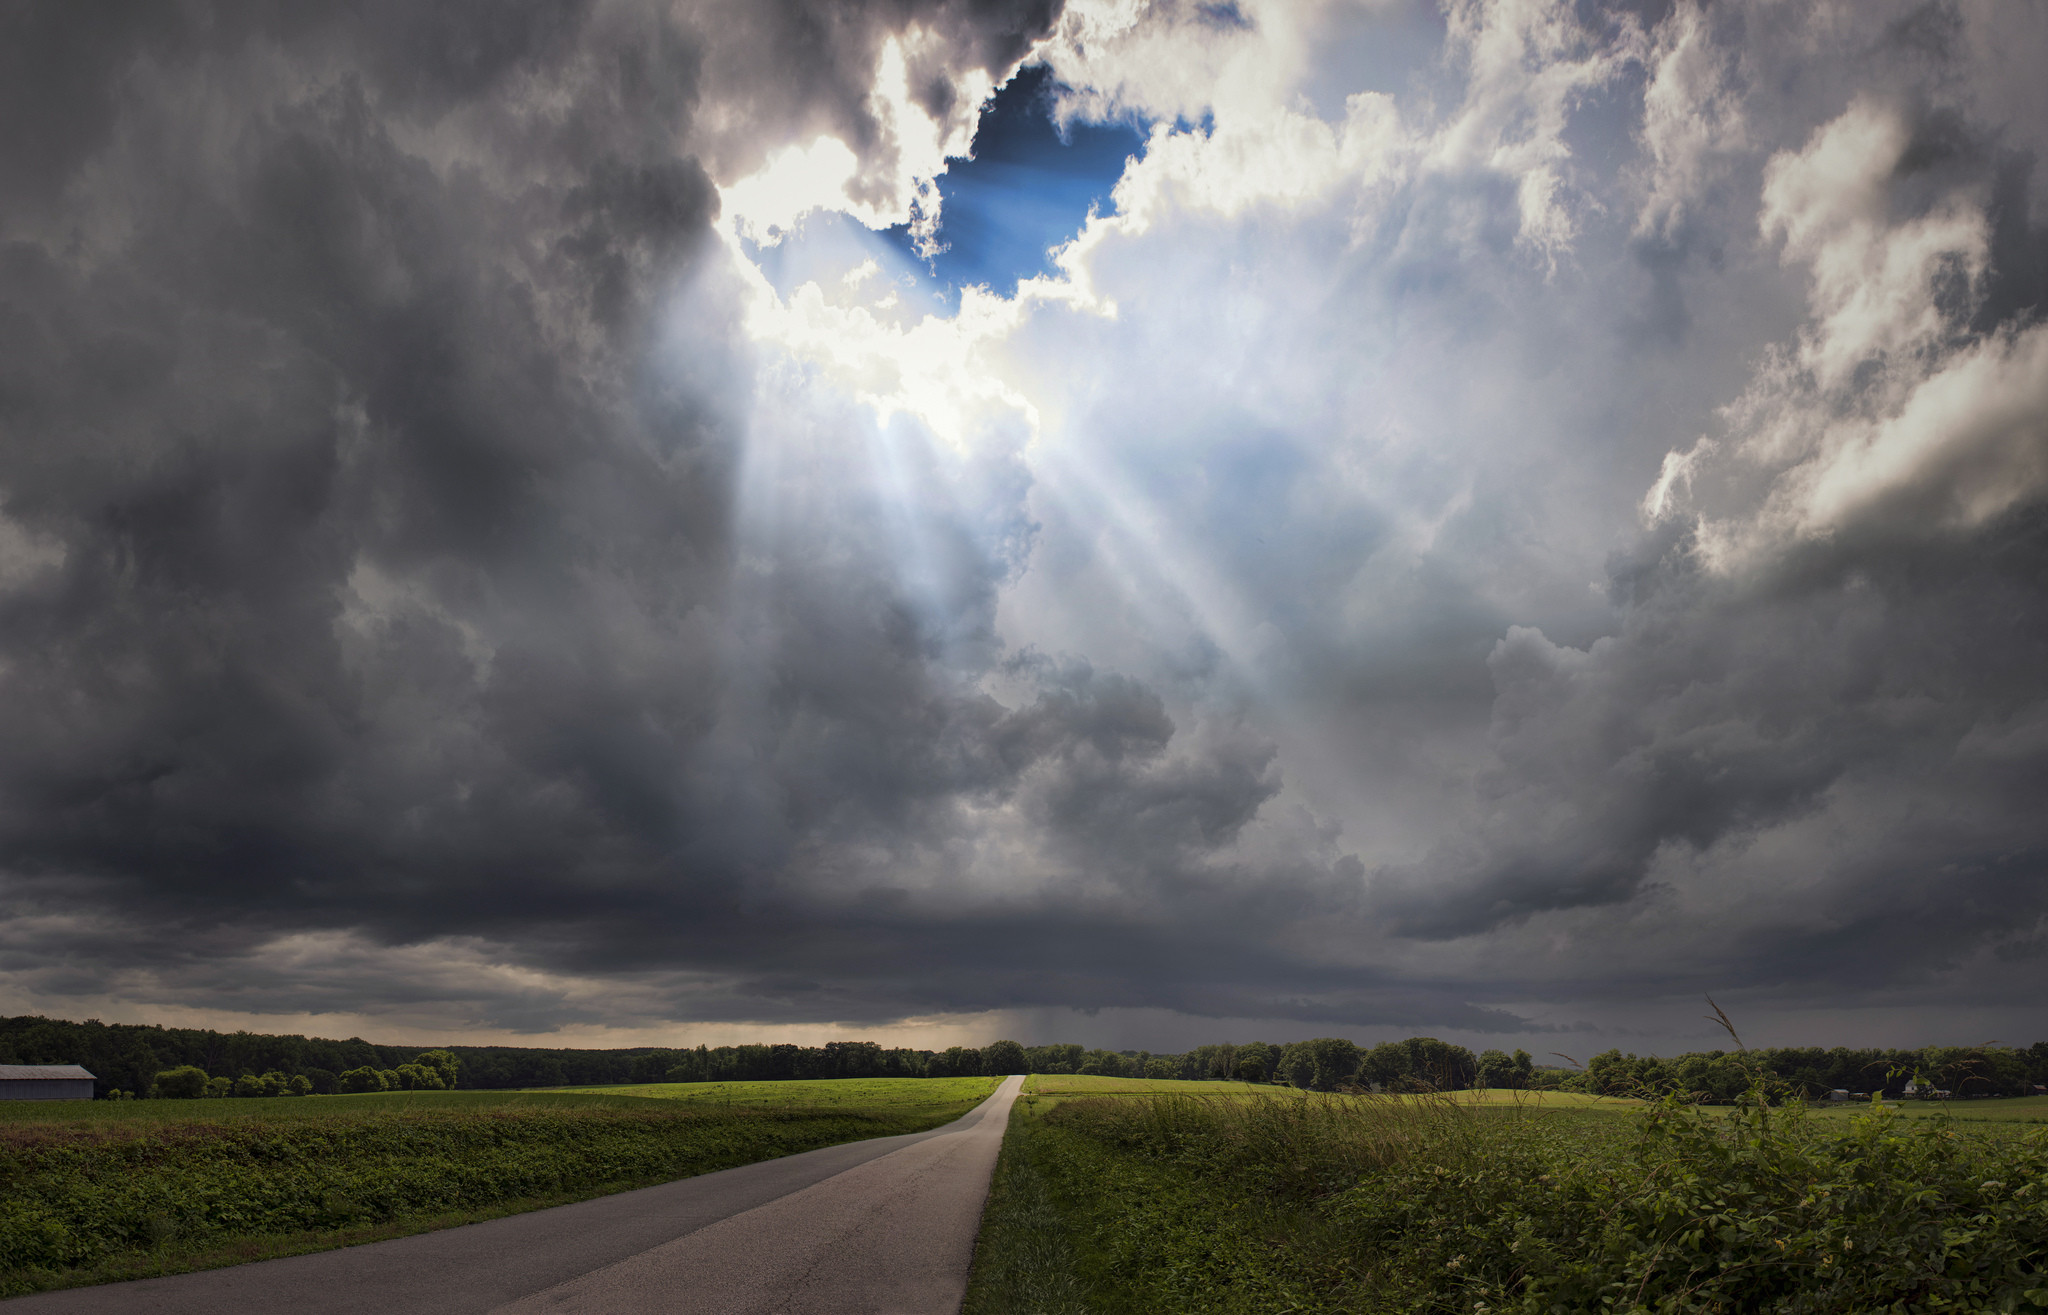 Field grass trees road sky skylight rays clouds storm wallpaper      112739   WallpaperUP